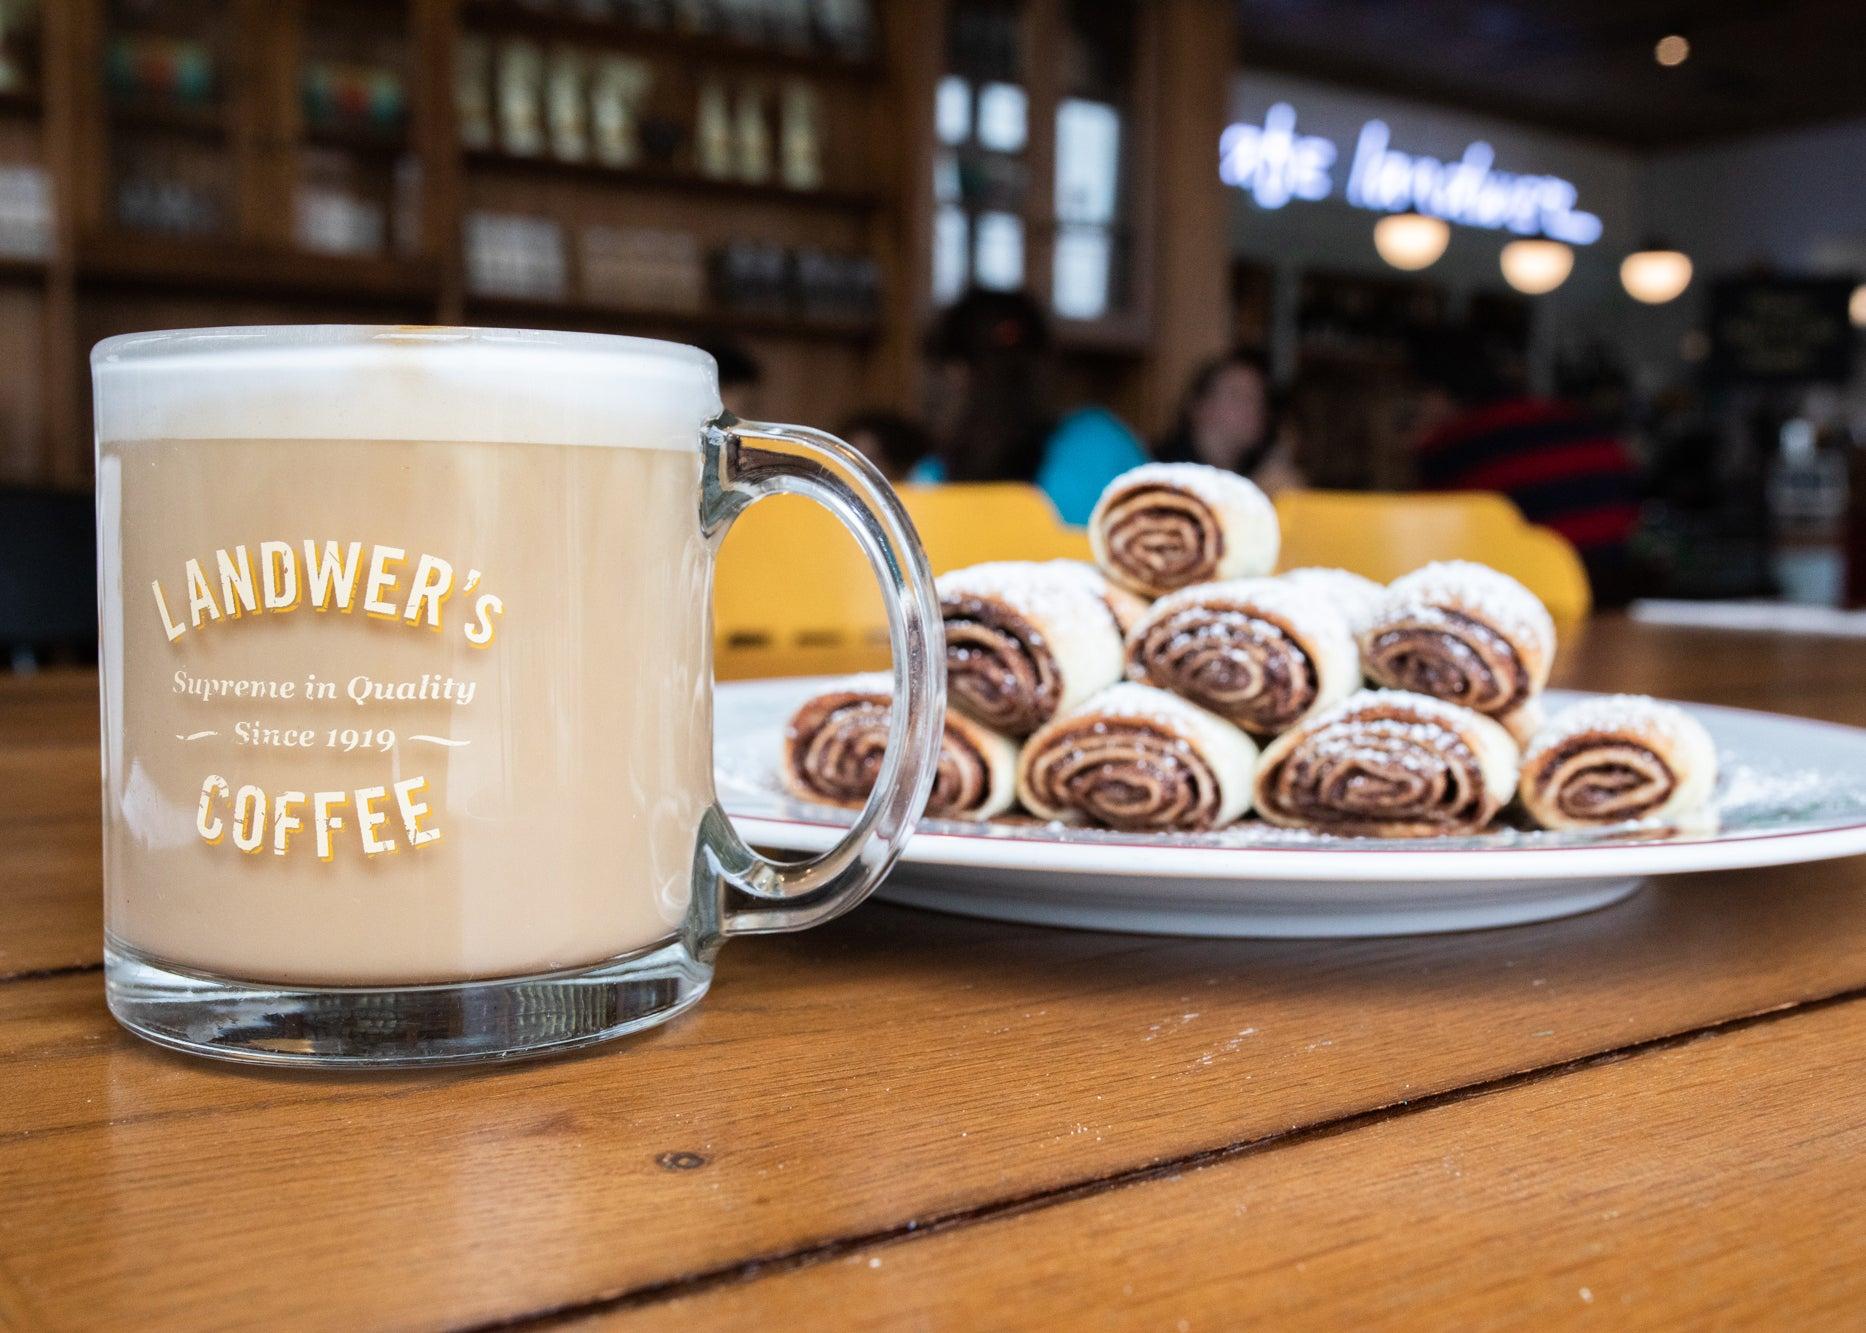 Cafe Landwer will launch a Nutella menu